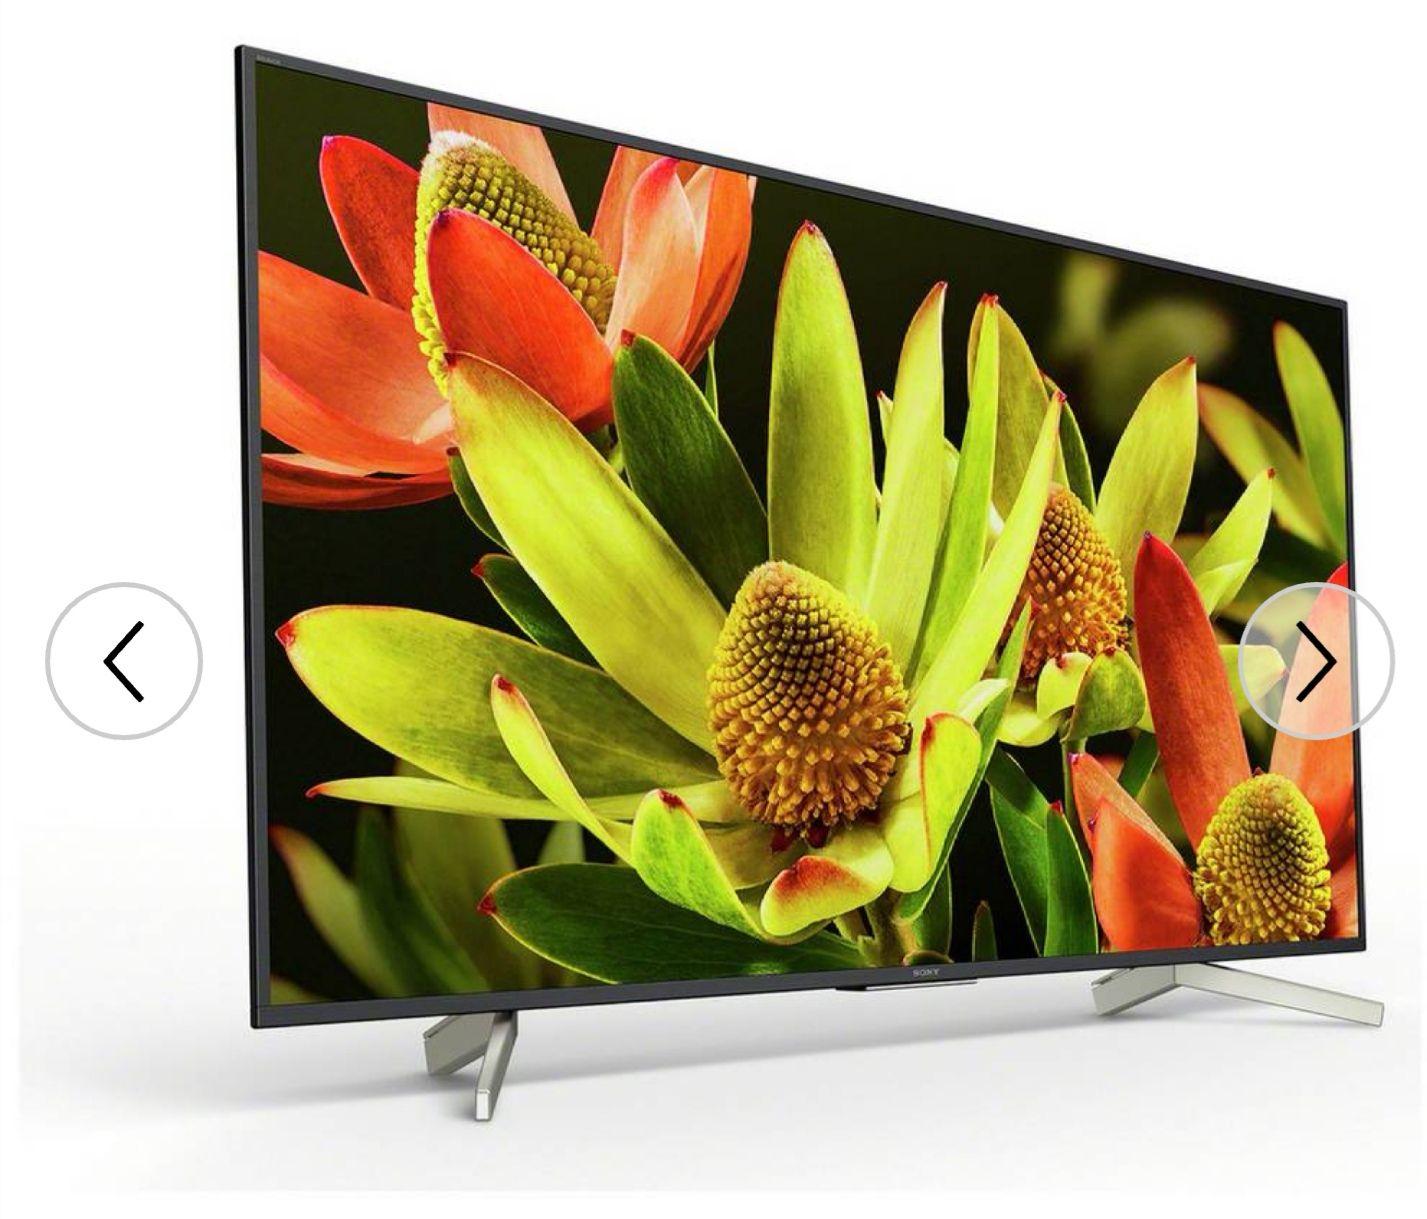 Sony 60 inch KD60XF8305BU 4K Ultra HD, HDR. £799 @ Argos (Same TV £1217 at Amazon)